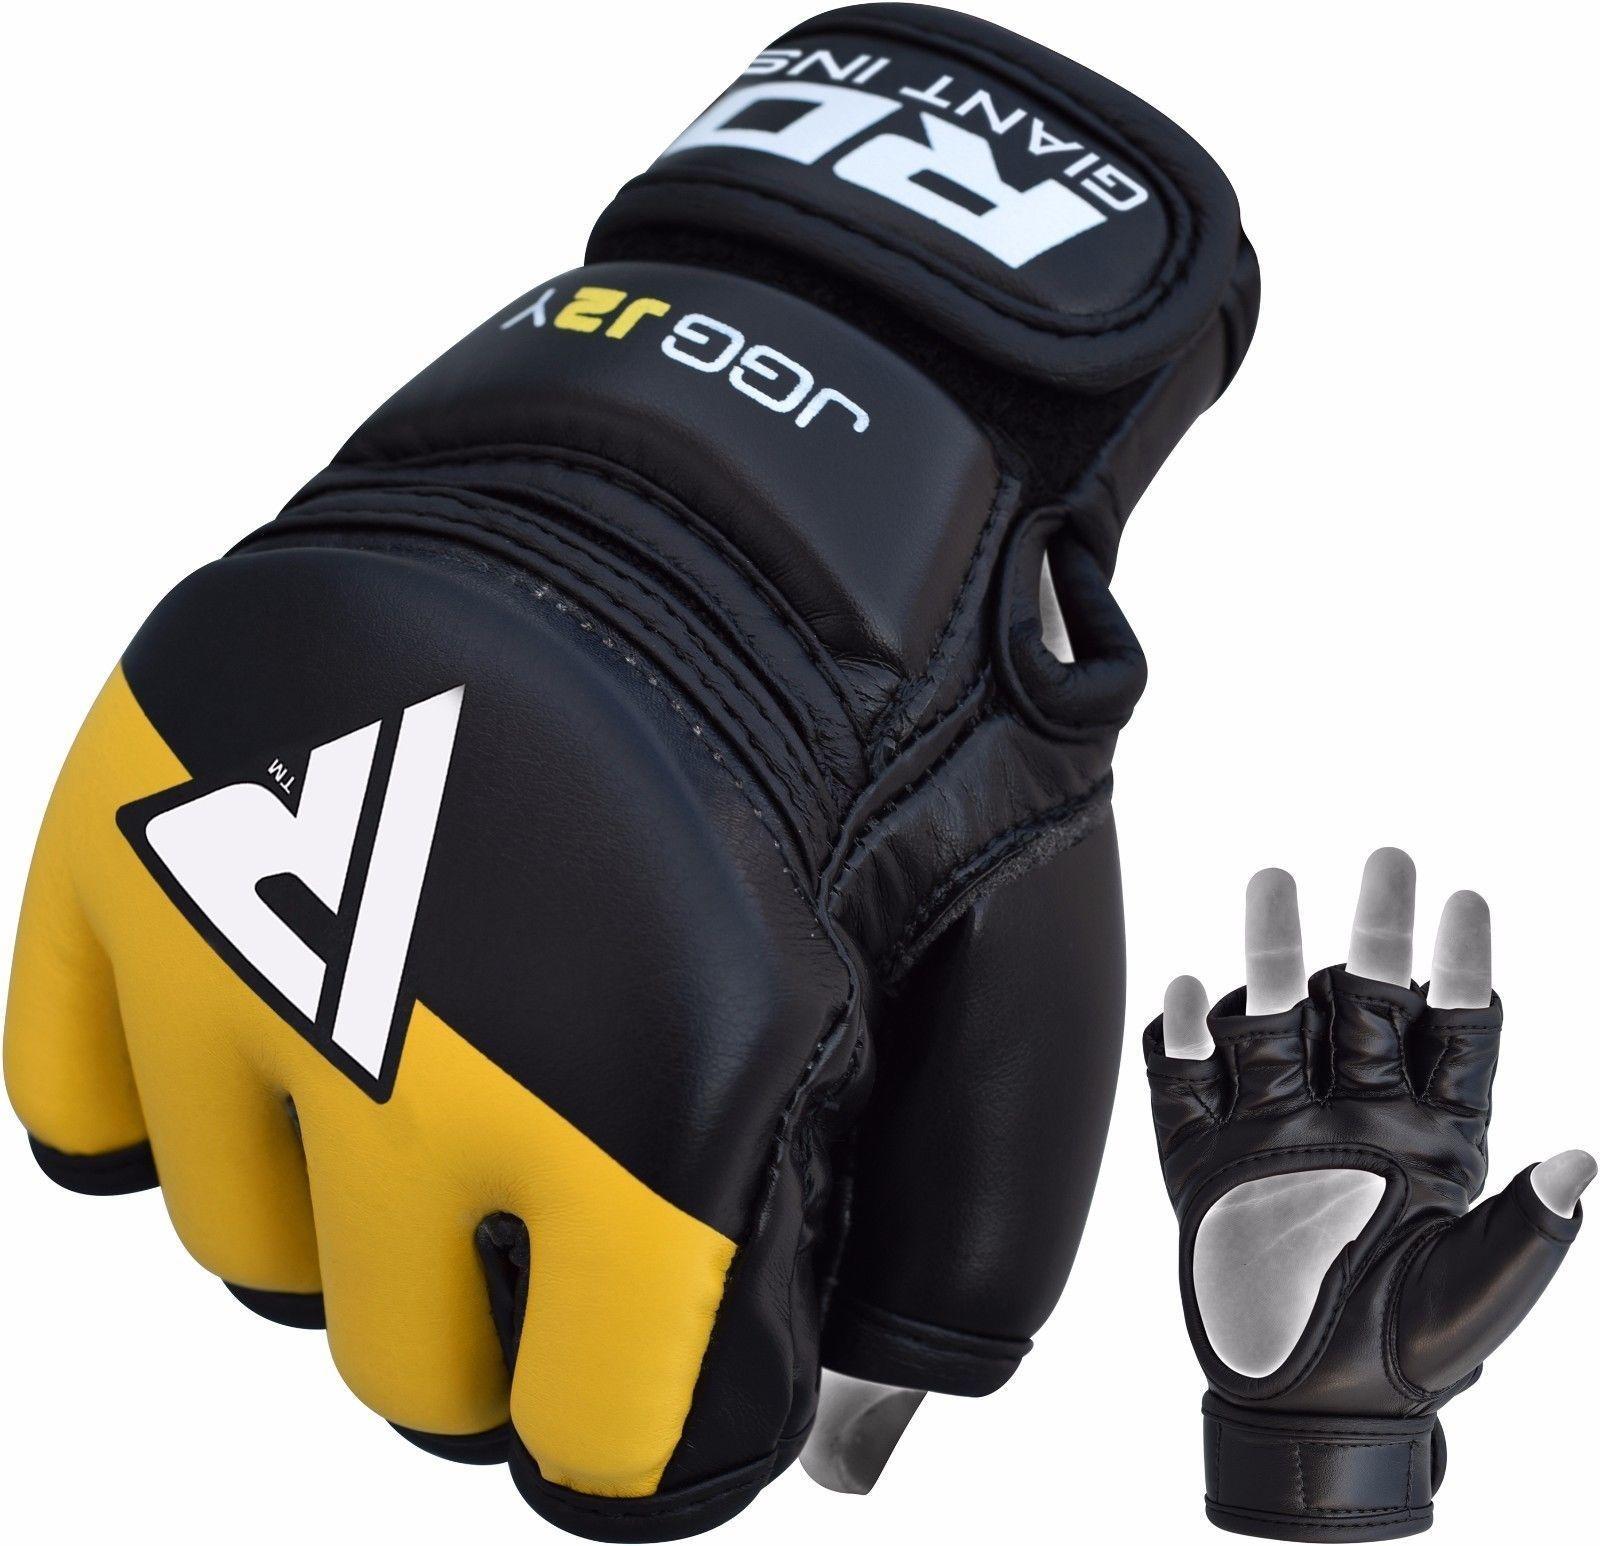 RDX Grappling Gloves Kids – Zwart met groen-538690